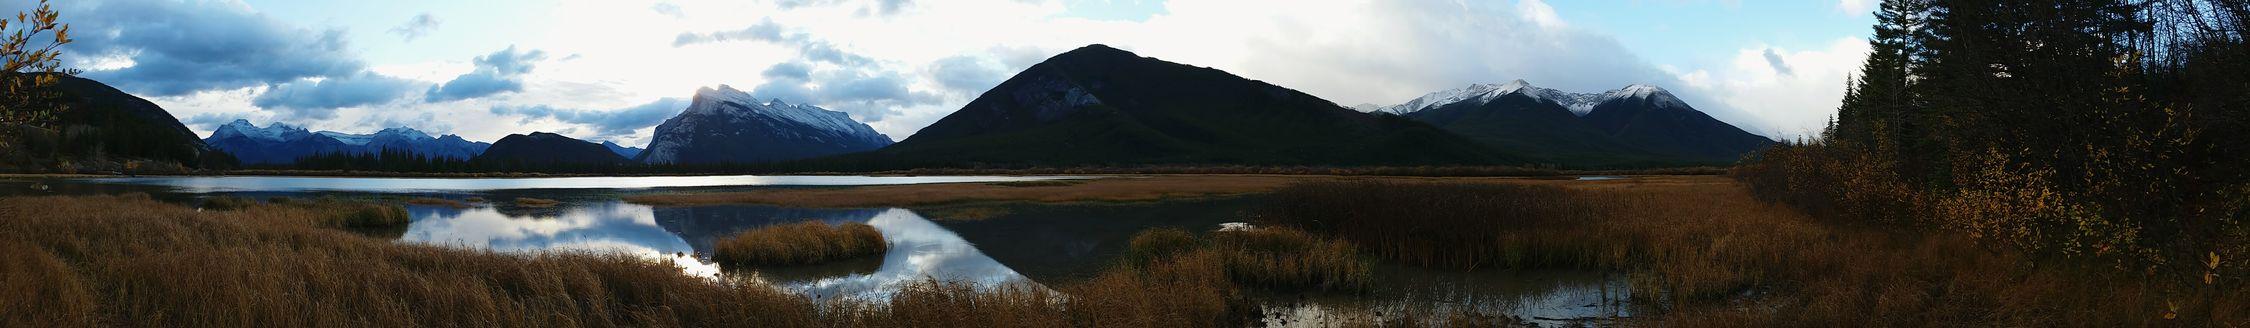 Mountains Active Lifestyle  Exploring Goodmorning World